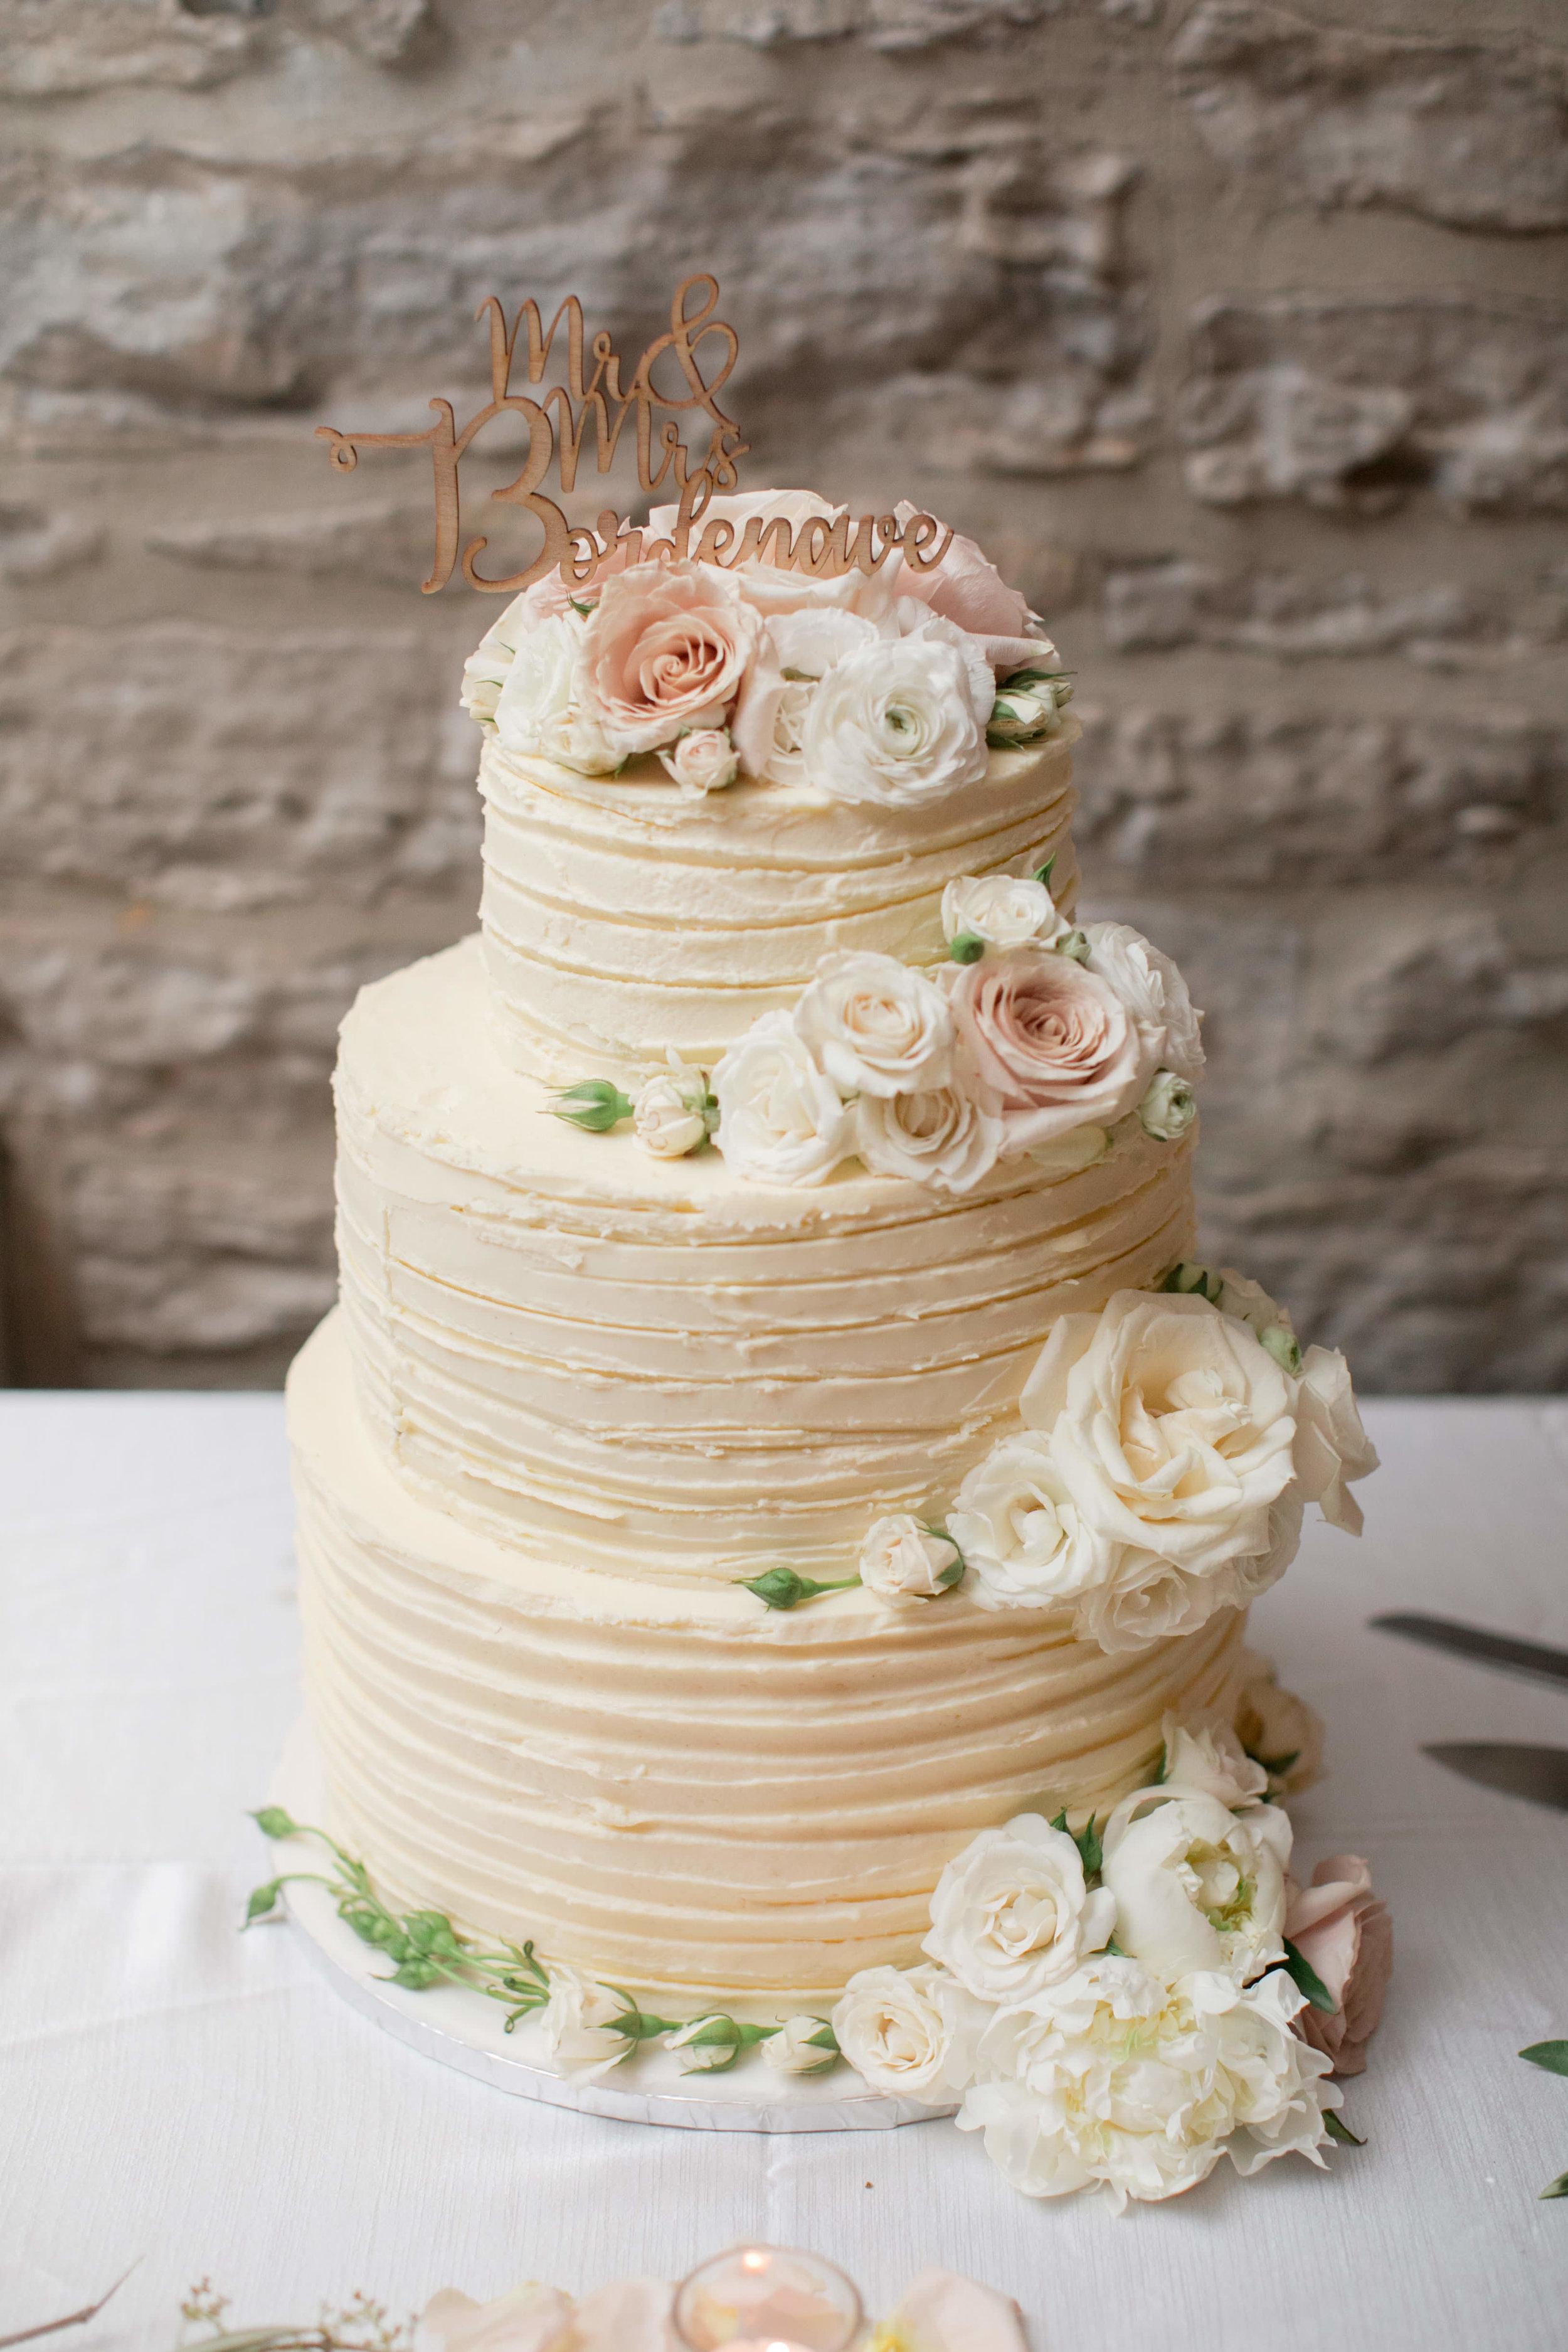 Miranda___Daniel___Daniel_Ricci_Weddings___High_Res._Finals_485.jpg